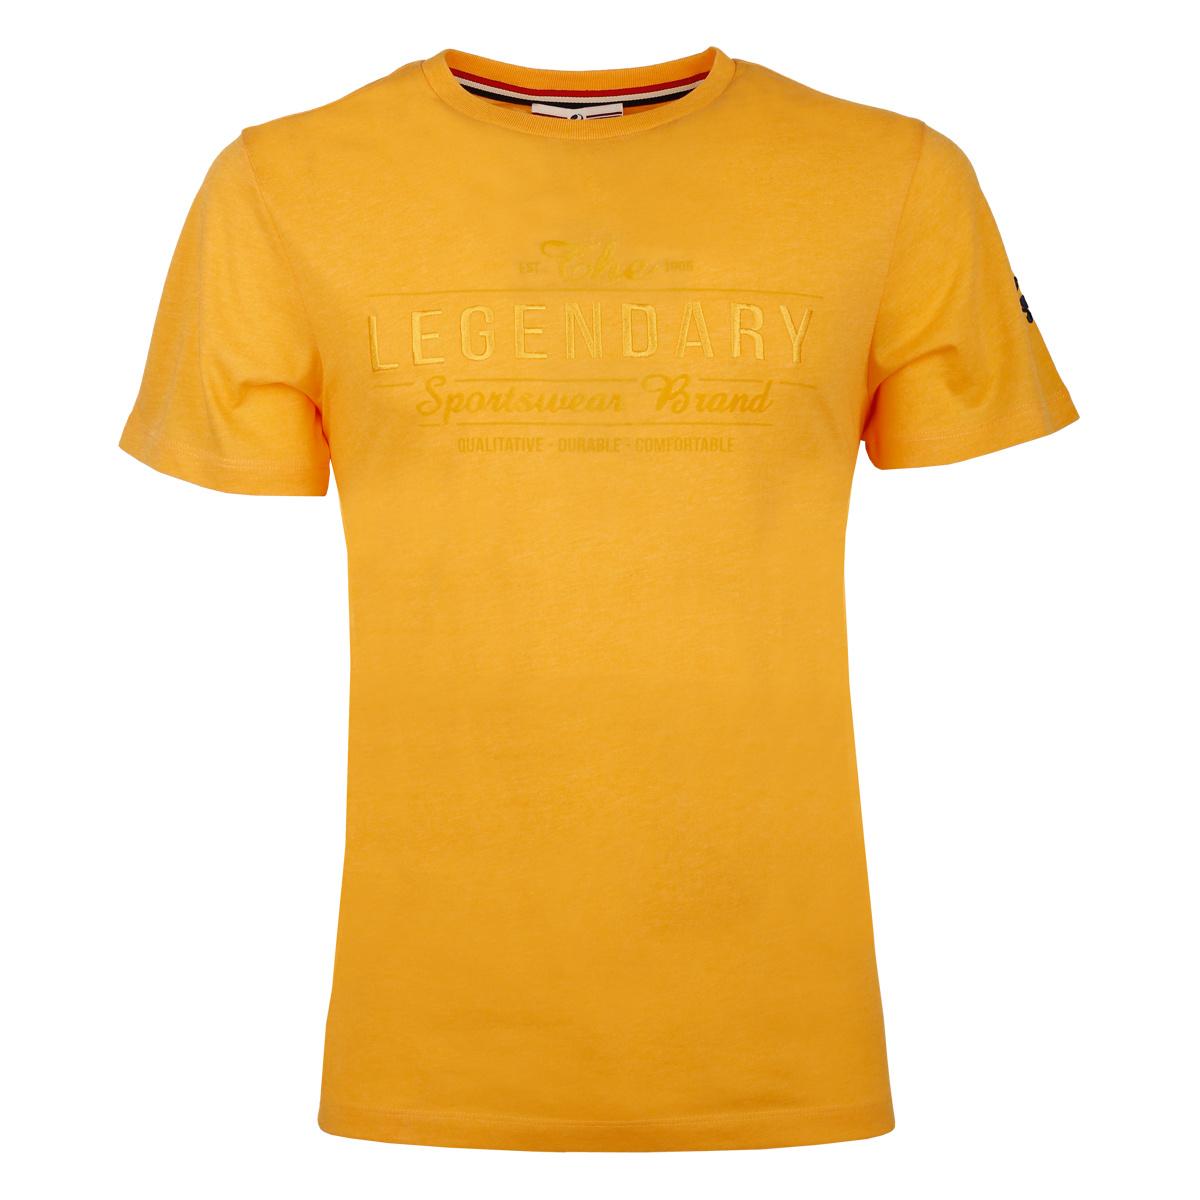 Q1905 Men U0026 39 S T-shirt Texel - Ochre Yellow